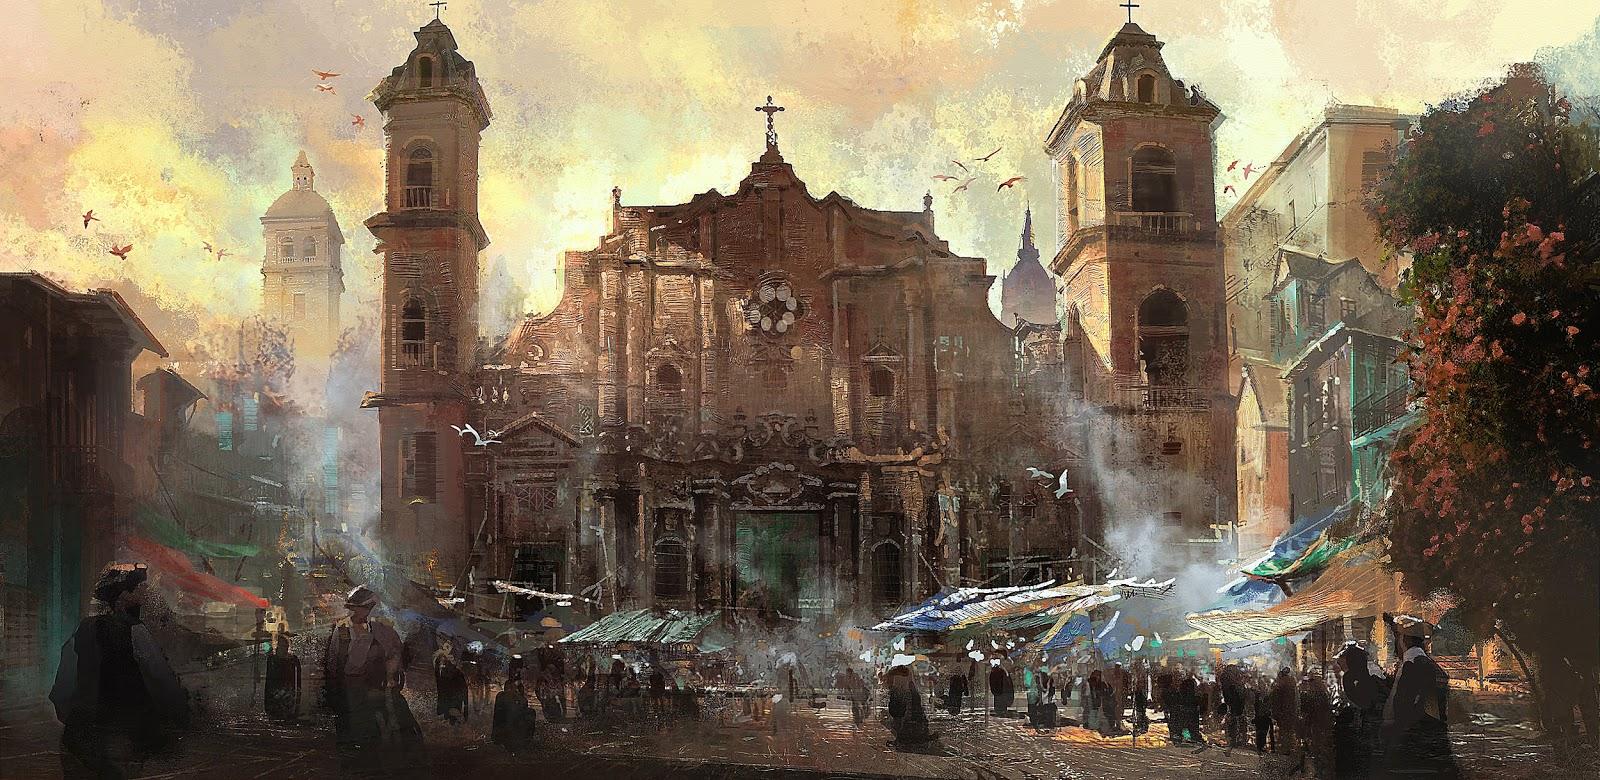 assassins creed iv black flag concept art 5 Assassins Creed IV: Black Flag   Concept Art